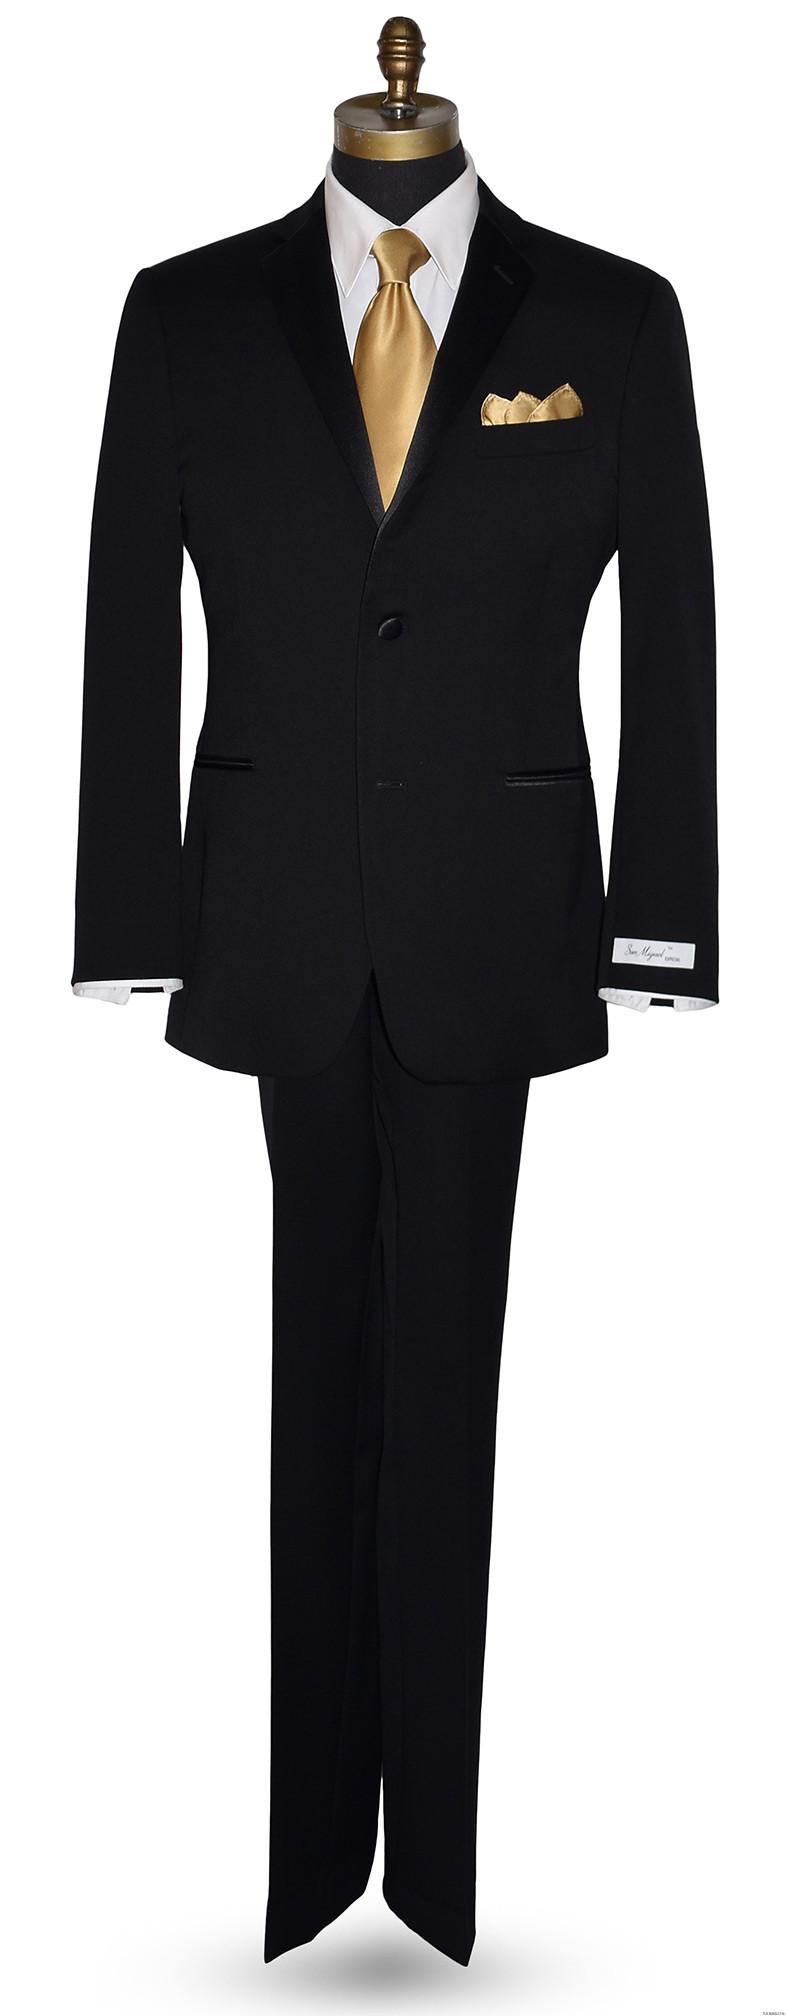 San Miguel Formals black men's tuxedo with gold silk long dress tie at Tuxbling.com